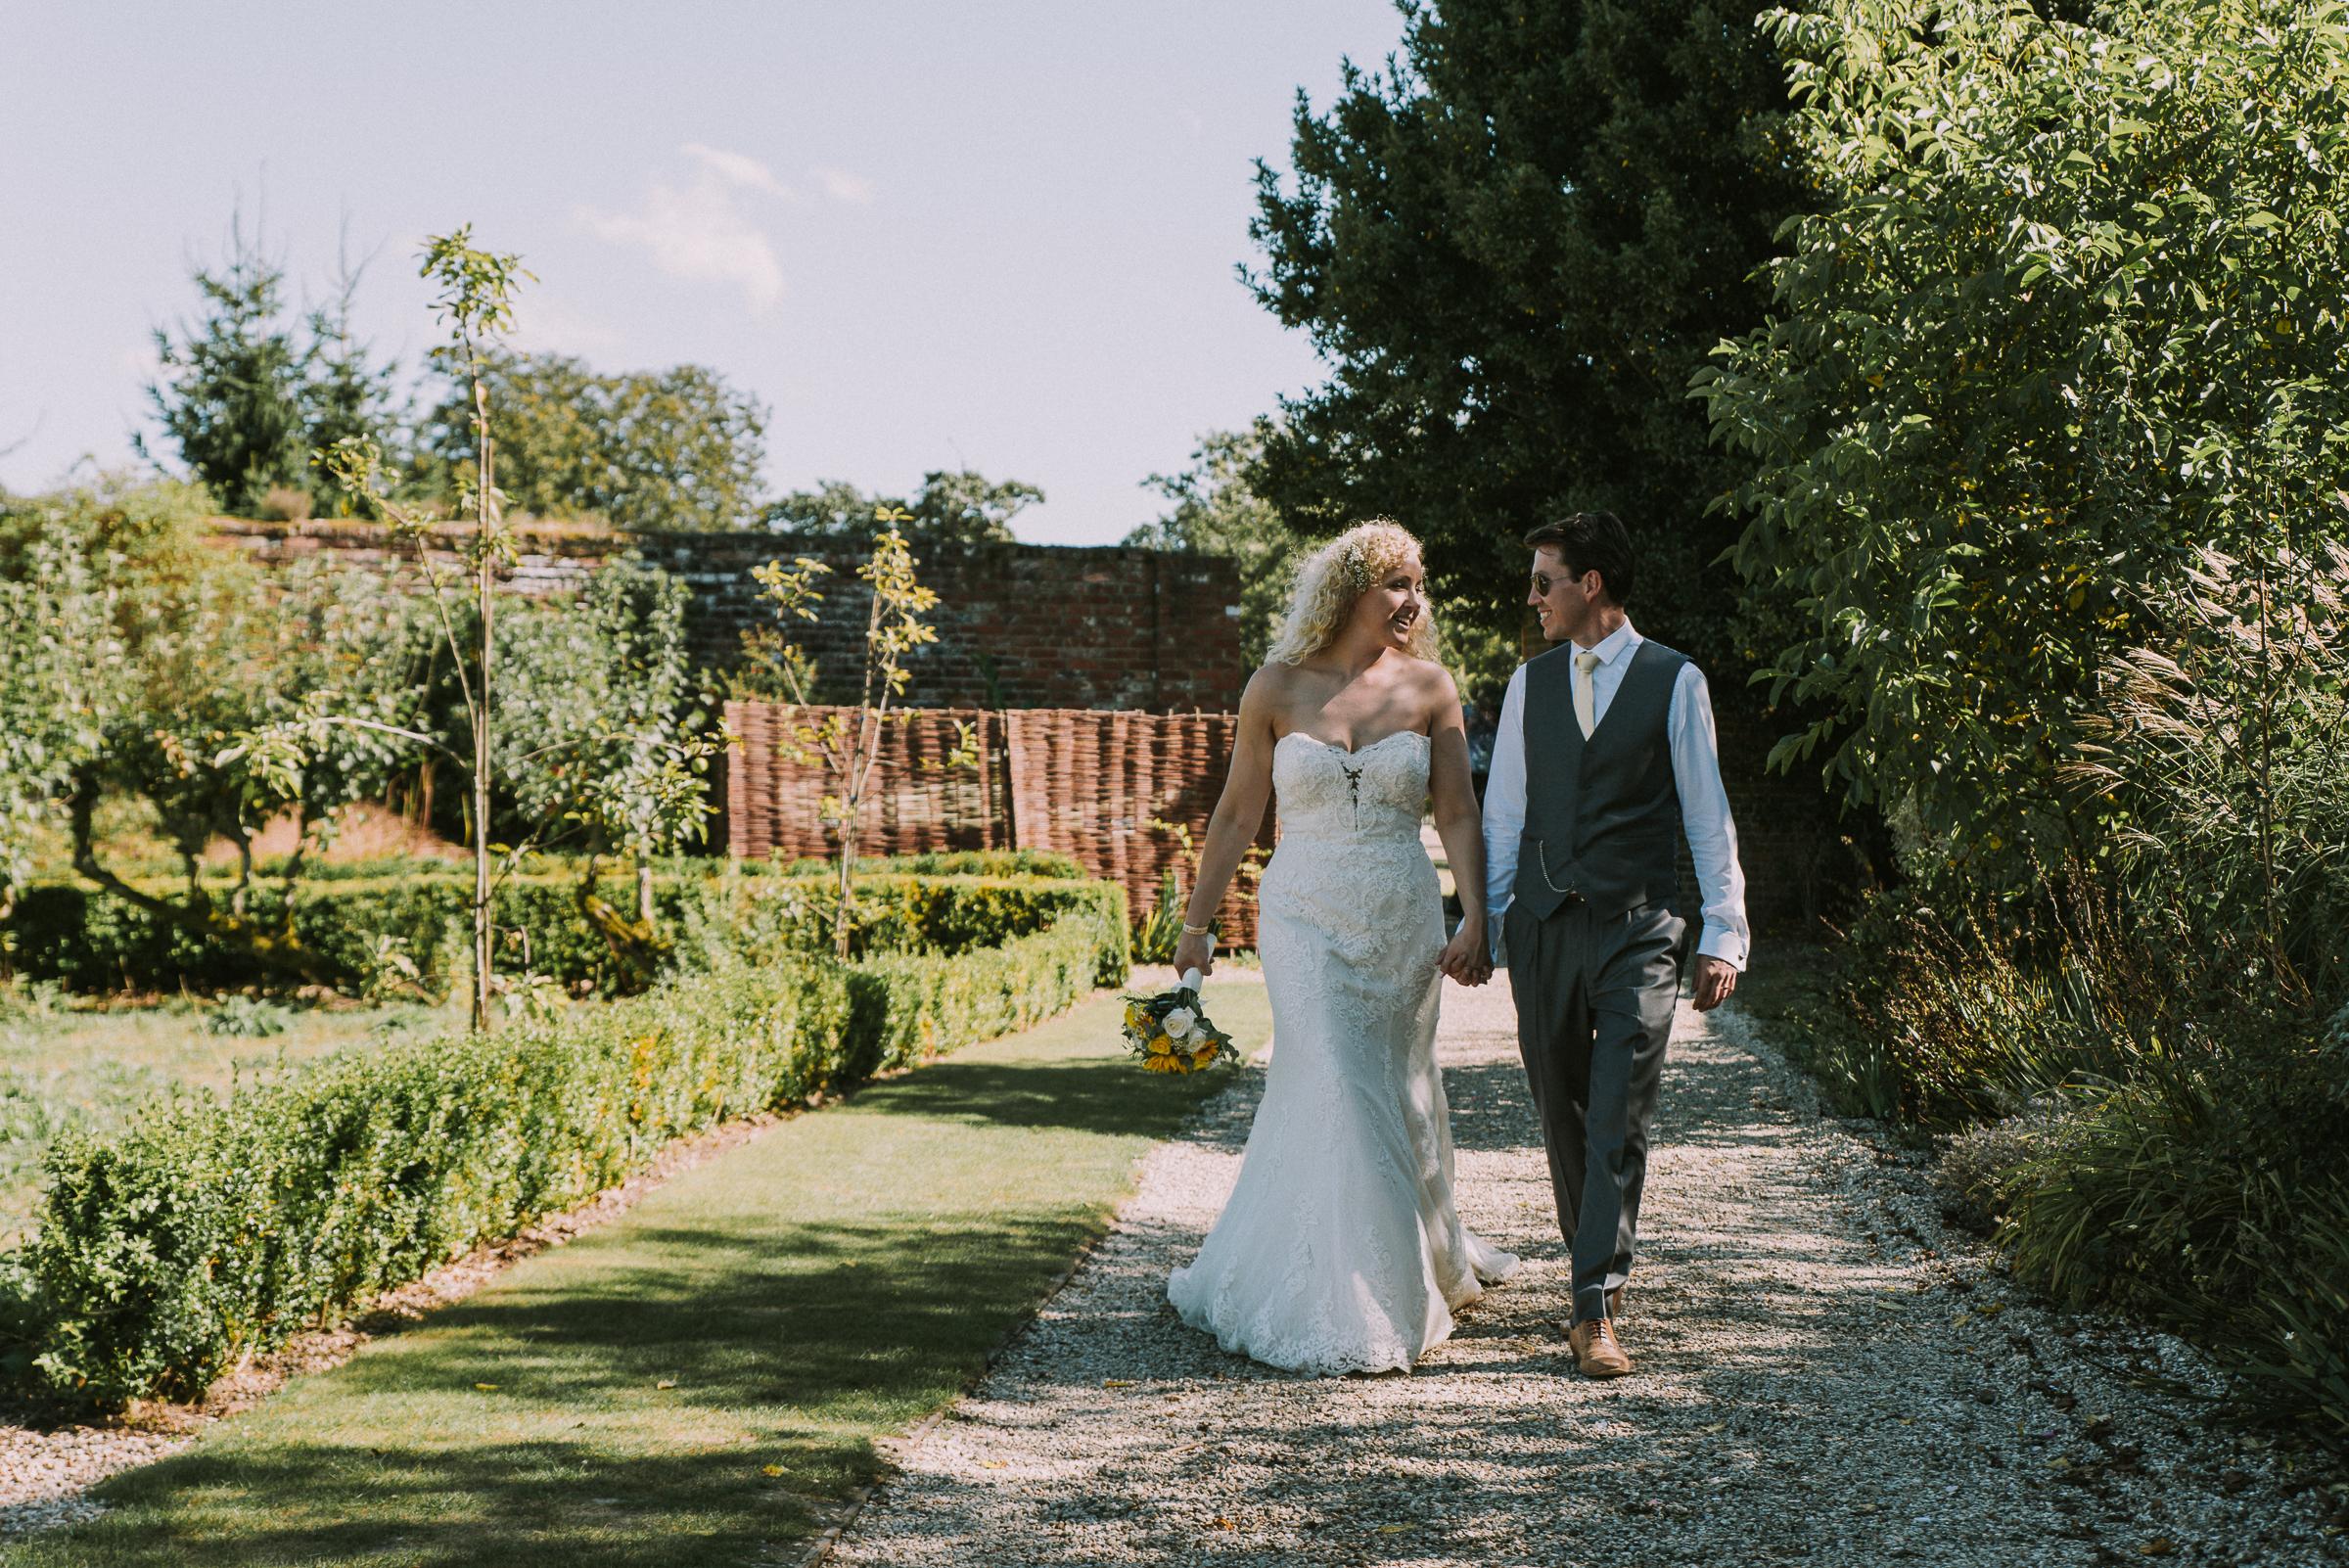 Festival Wedding Photography Secret Garden Maidstone Kent Jay Tunbridge Photorgaphic Co-40.jpg